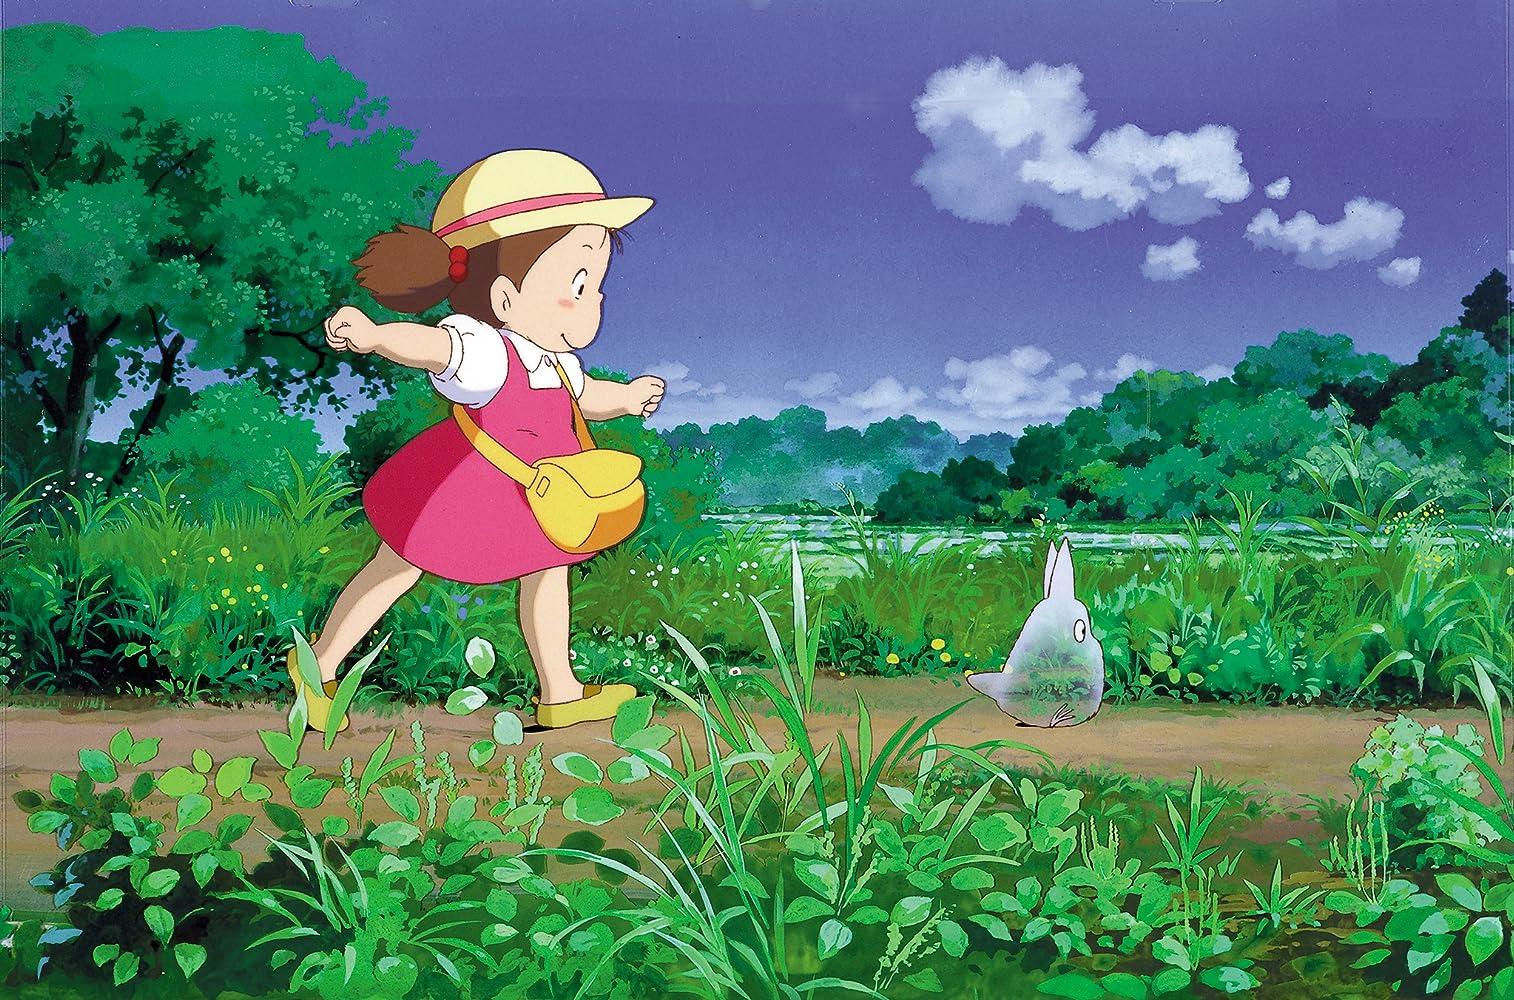 Chika Sakamoto in Tonari no Totoro (1988)